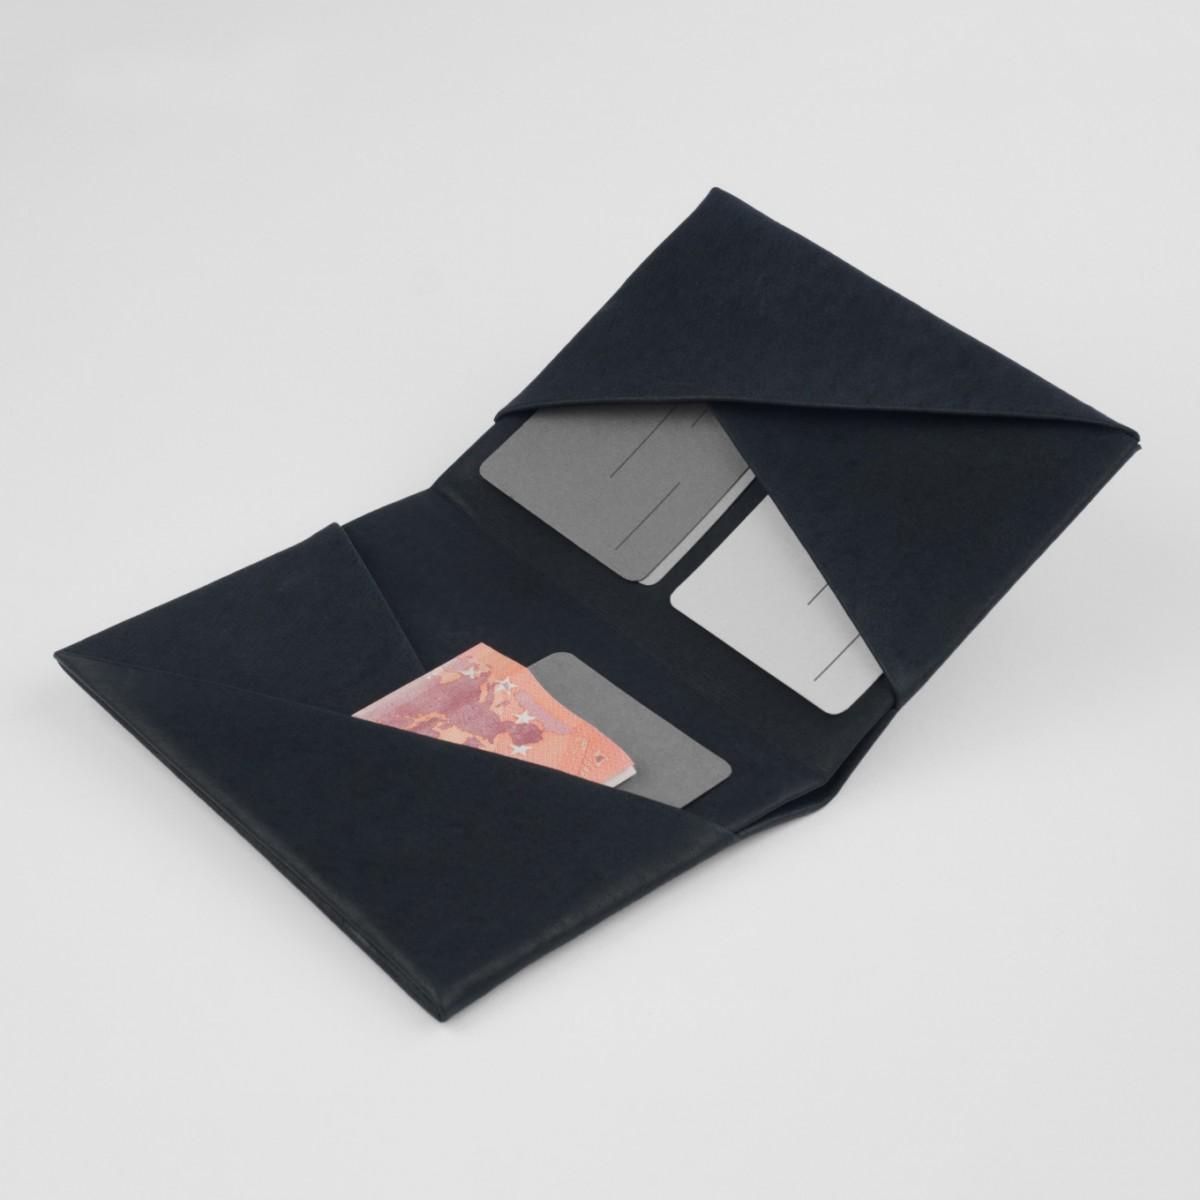 VANOOK Bi-Fold Card Case Large / Charcoal